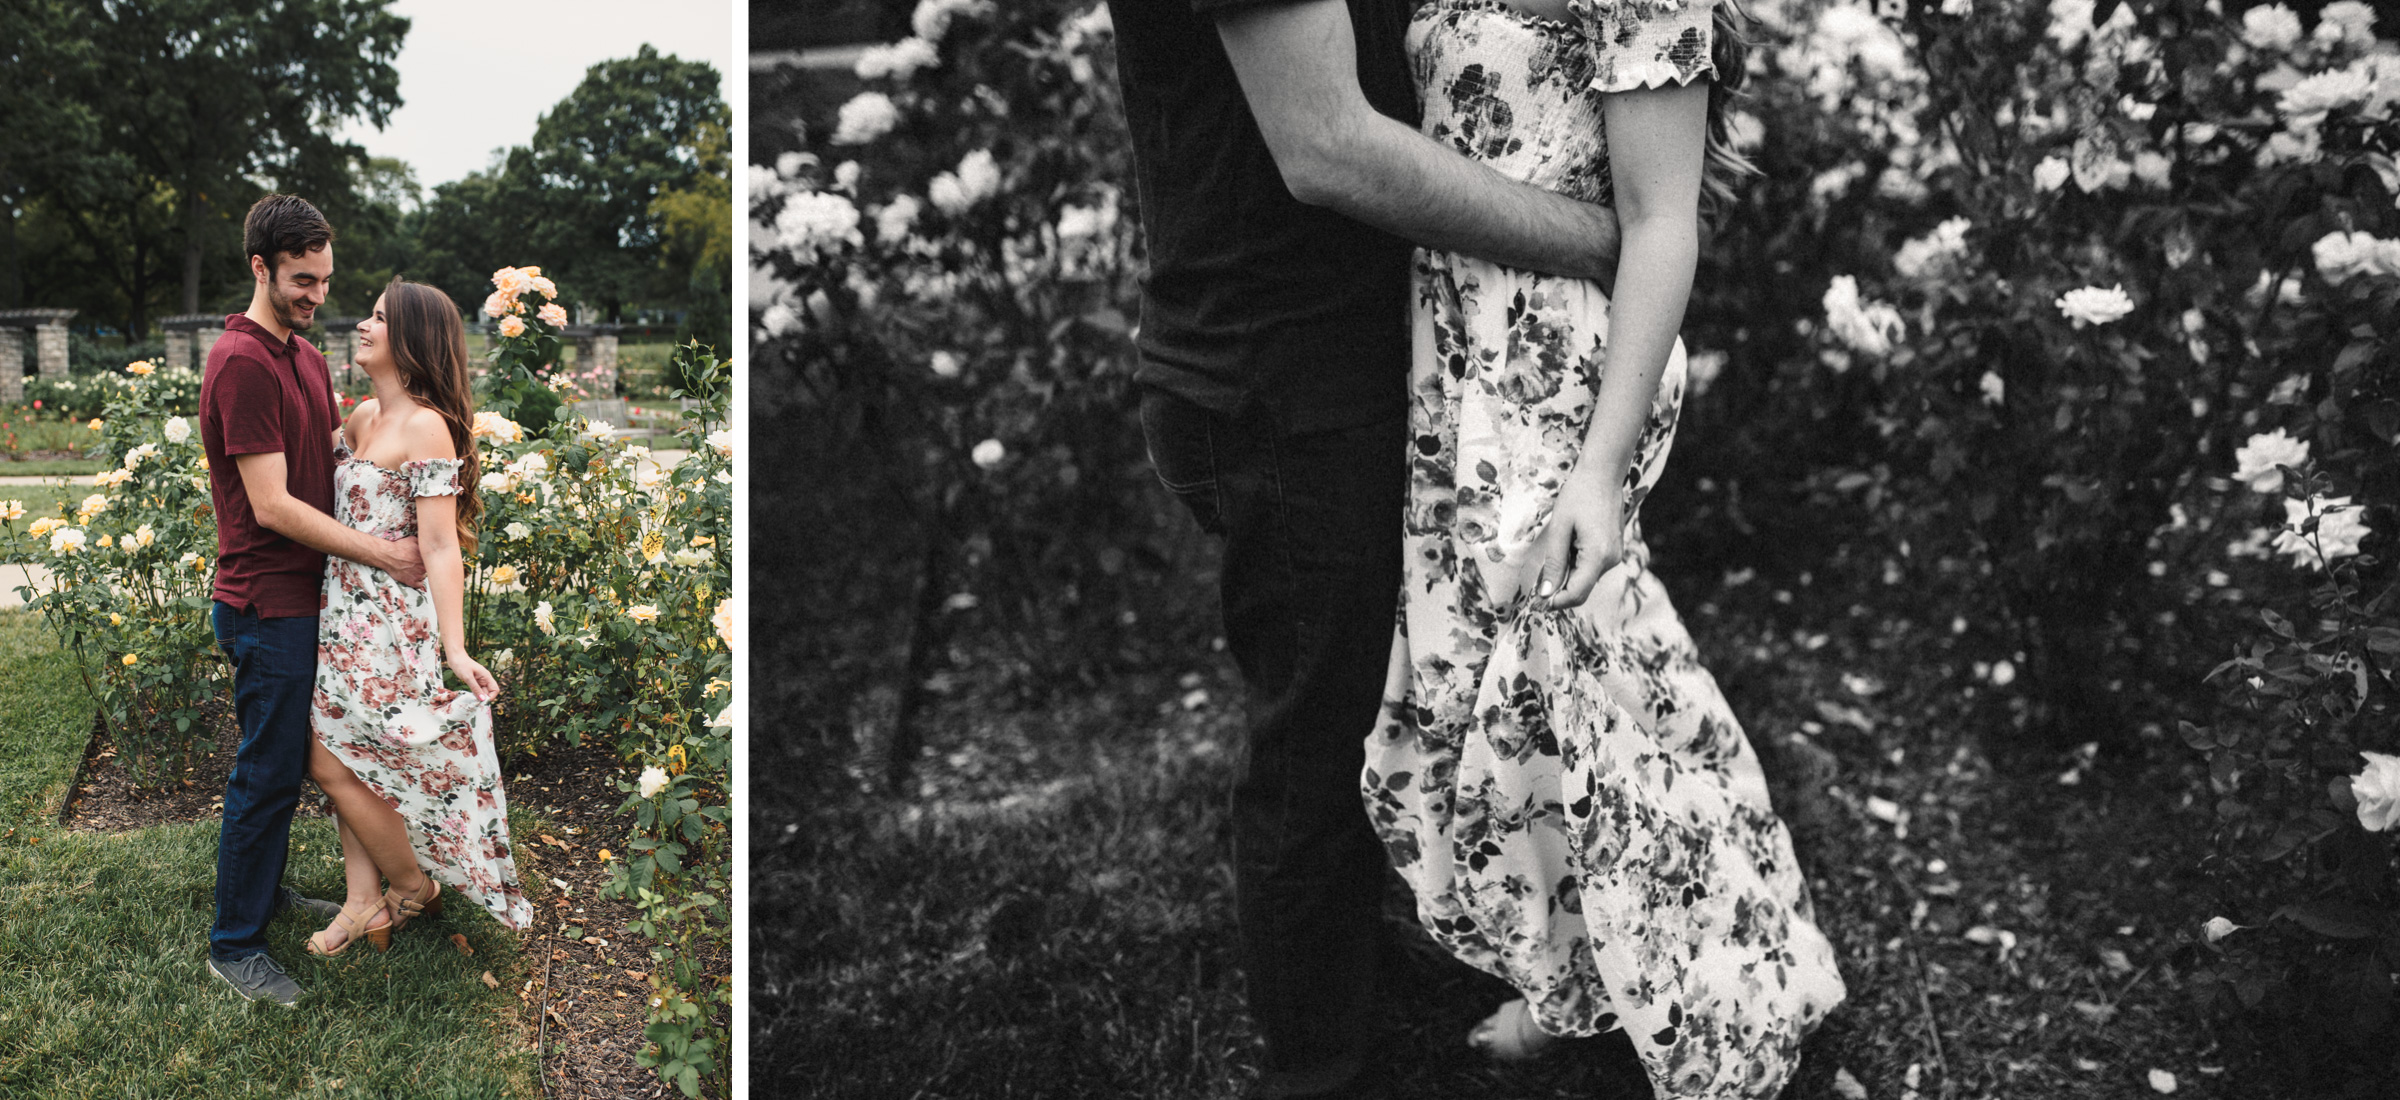 Beginning of Fall_Bliss_Engagement_Kansas_City_Kelsey_Diane_Photography_2.jpg